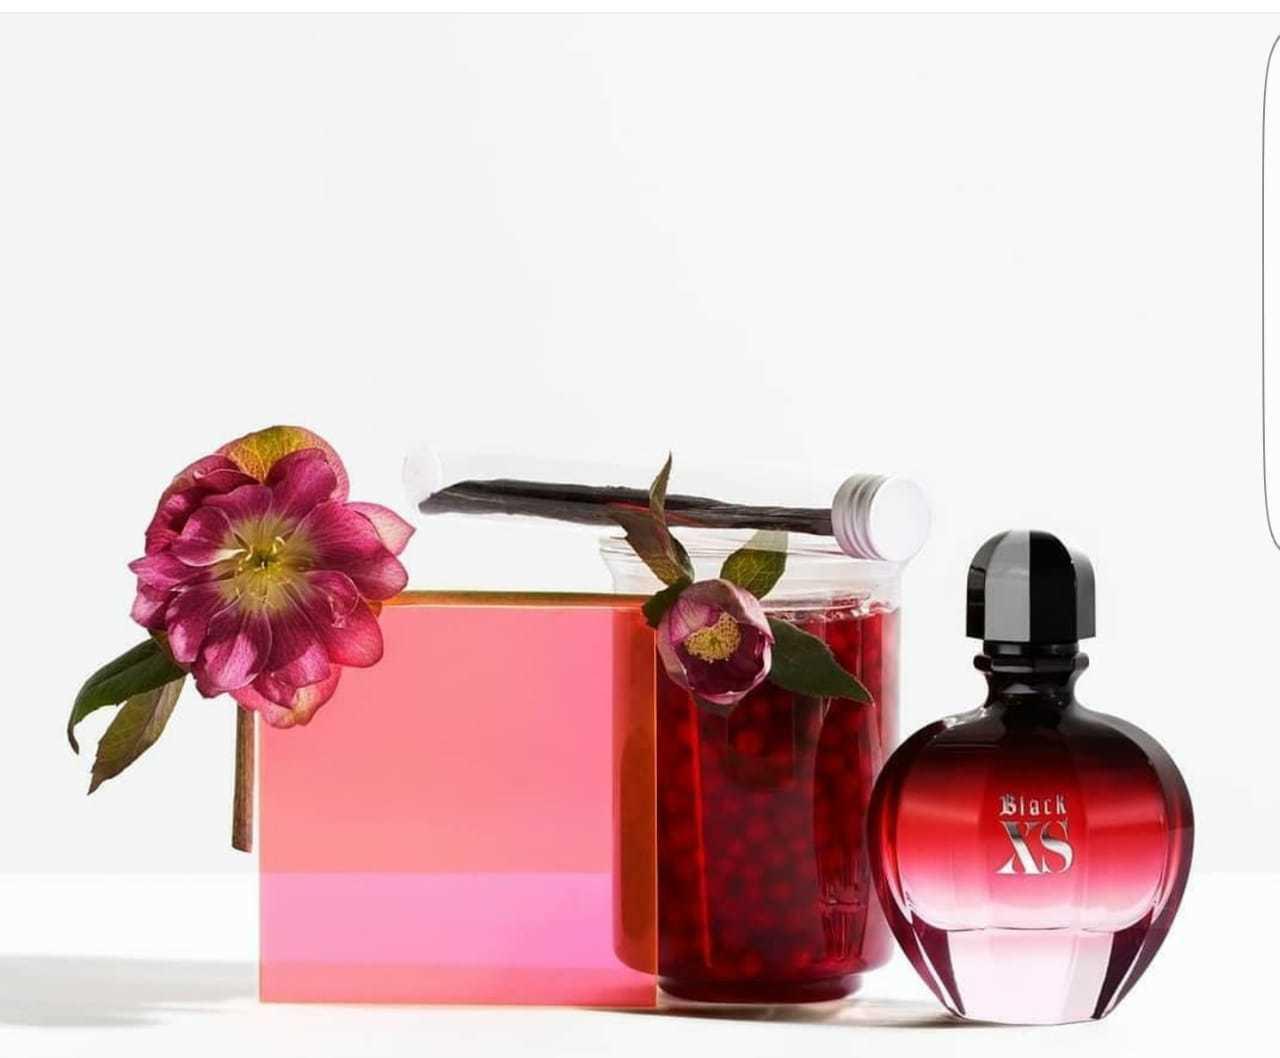 Eau de Parfum Feminino Paco Rabanne Black XS for Her 50 ml MS Cosmético